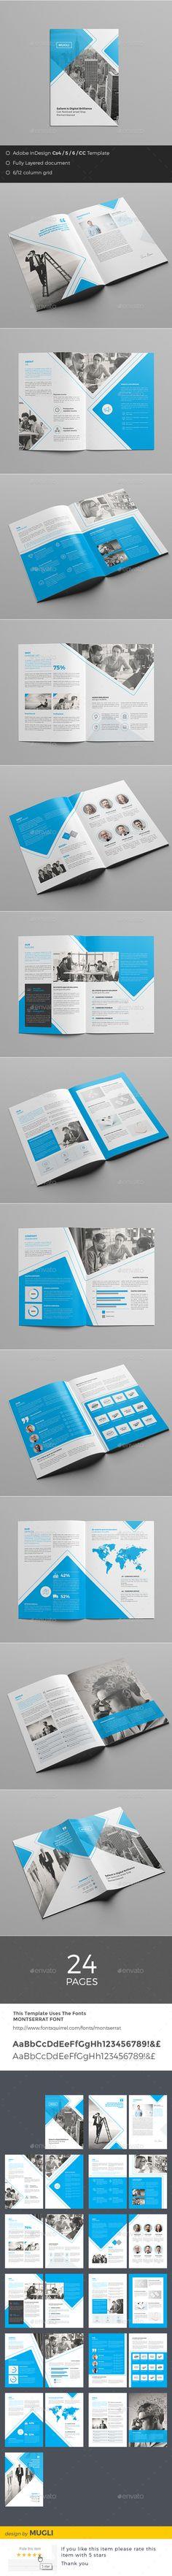 Business Brochure Template InDesign INDD. Download here: http://graphicriver.net/item/business-brochure/15902399?ref=ksioks